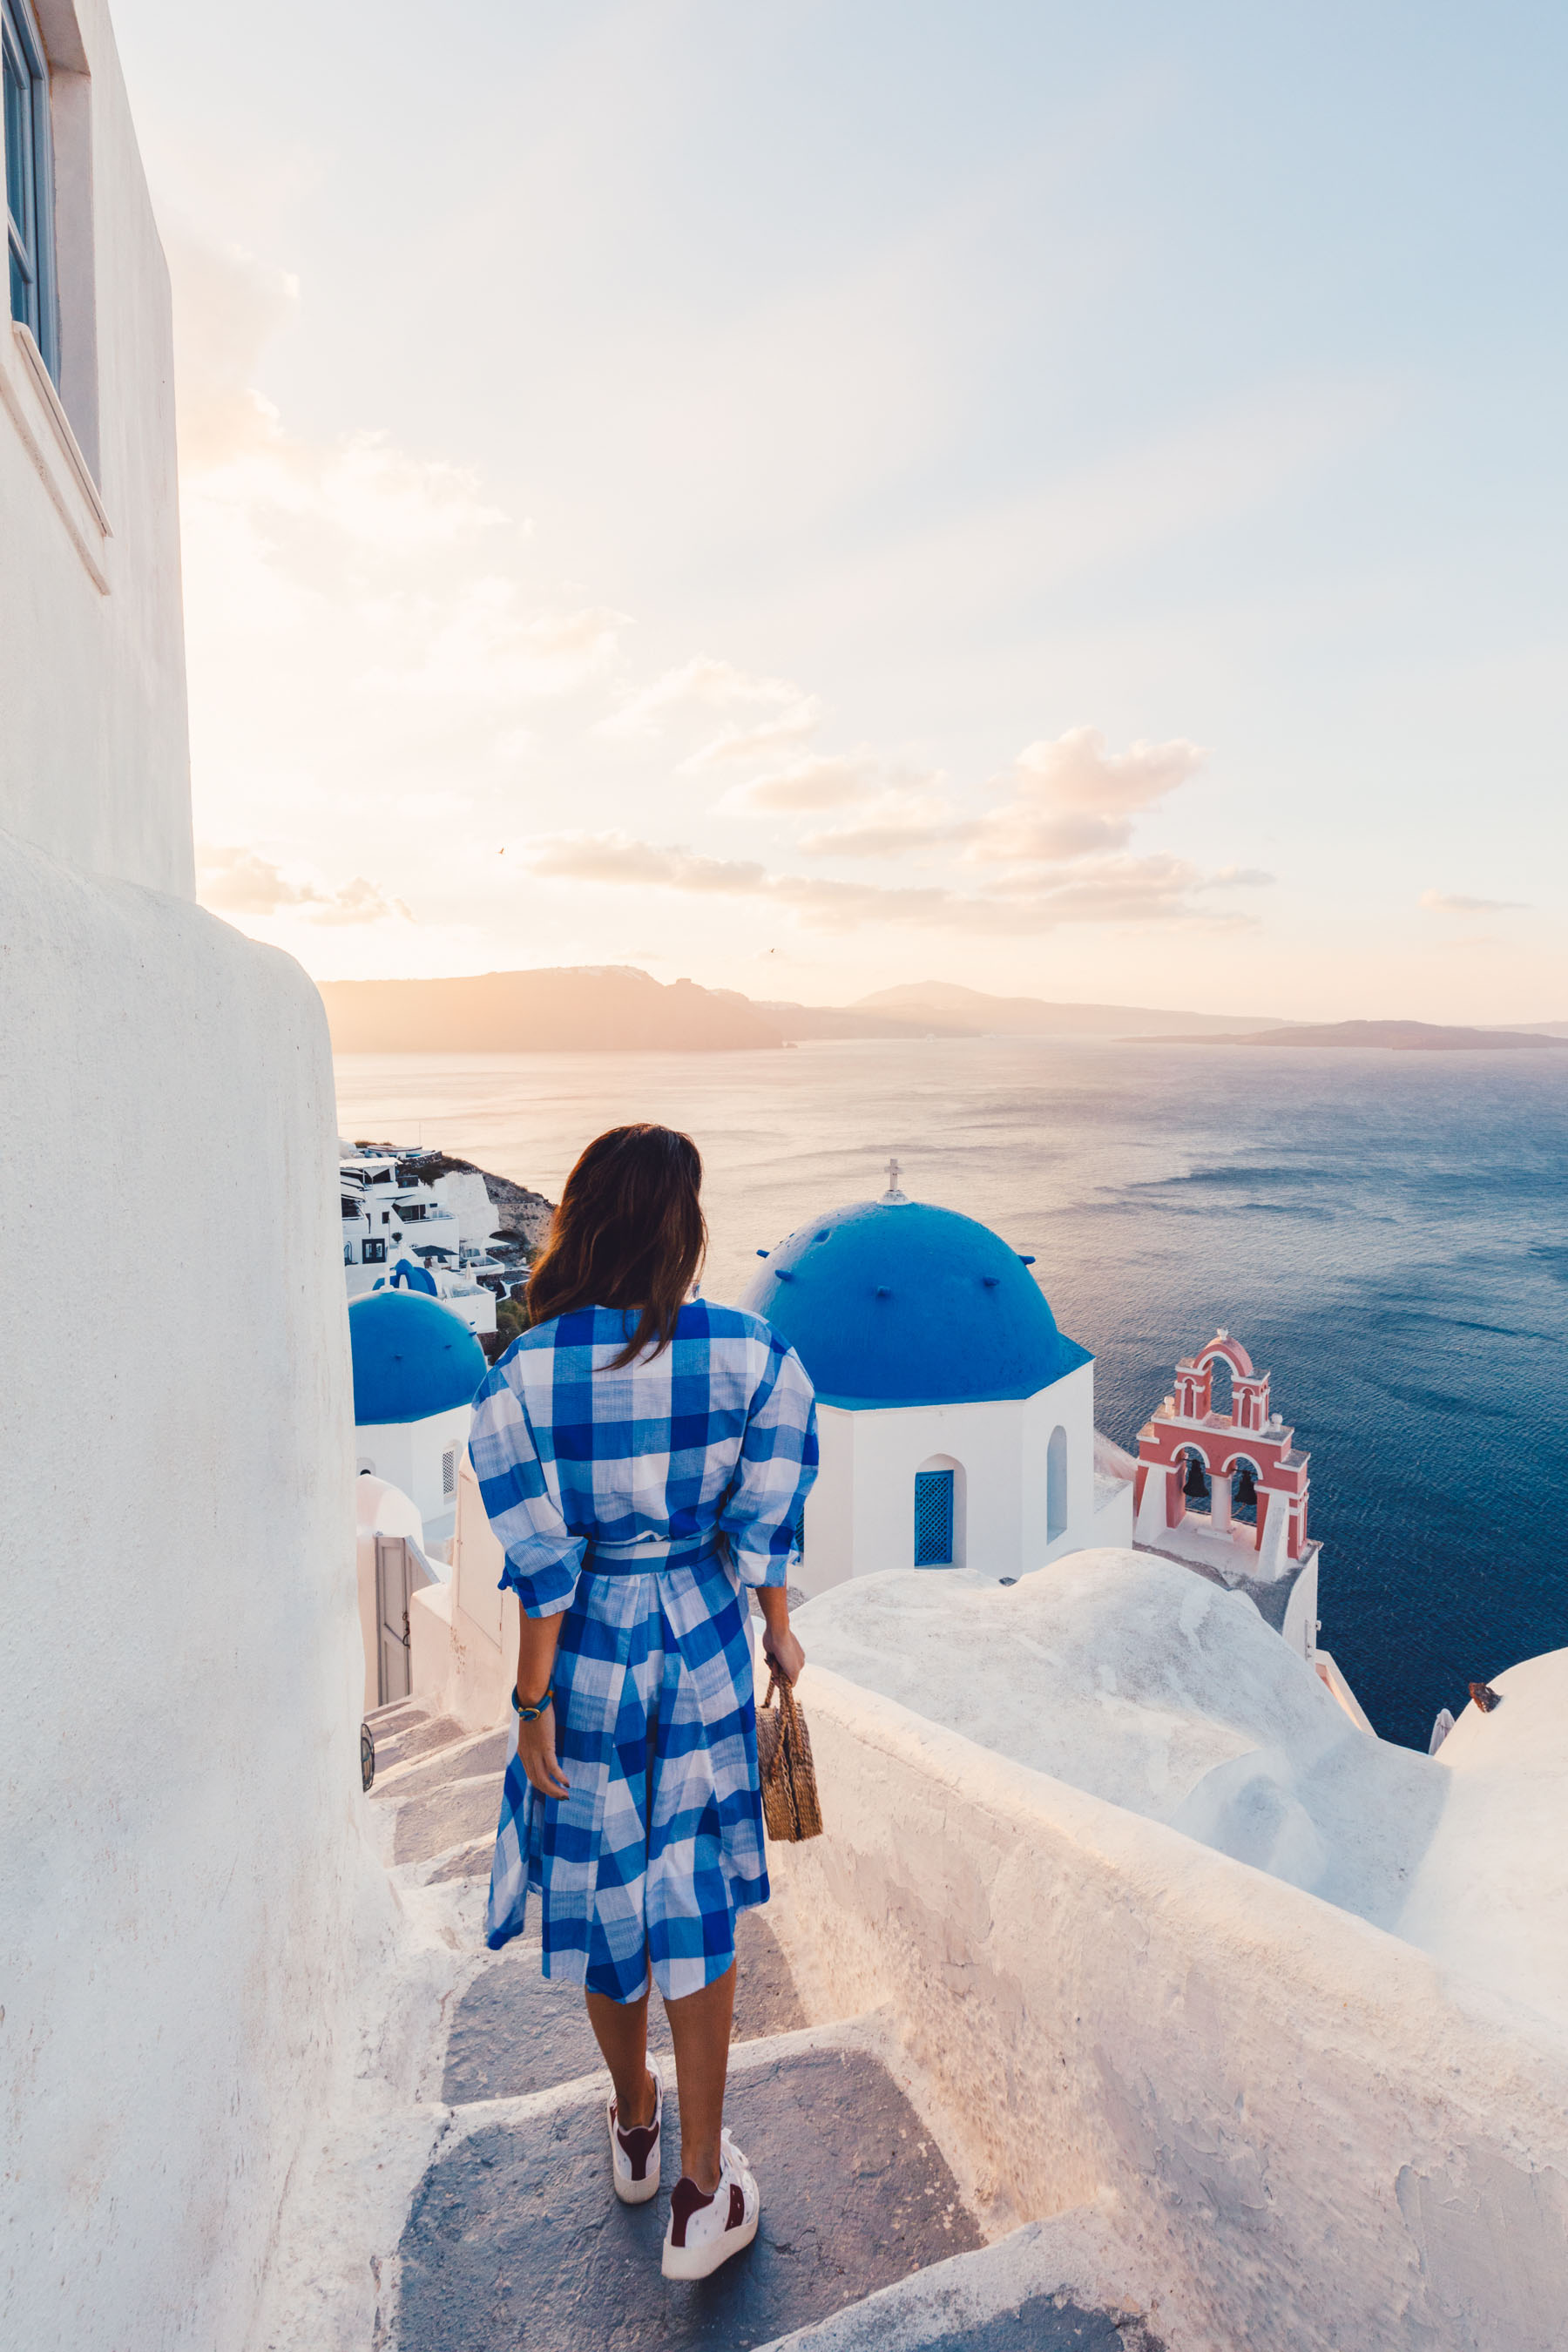 The Complete Santorini Greece Travel Guide summer getaways - photo#42